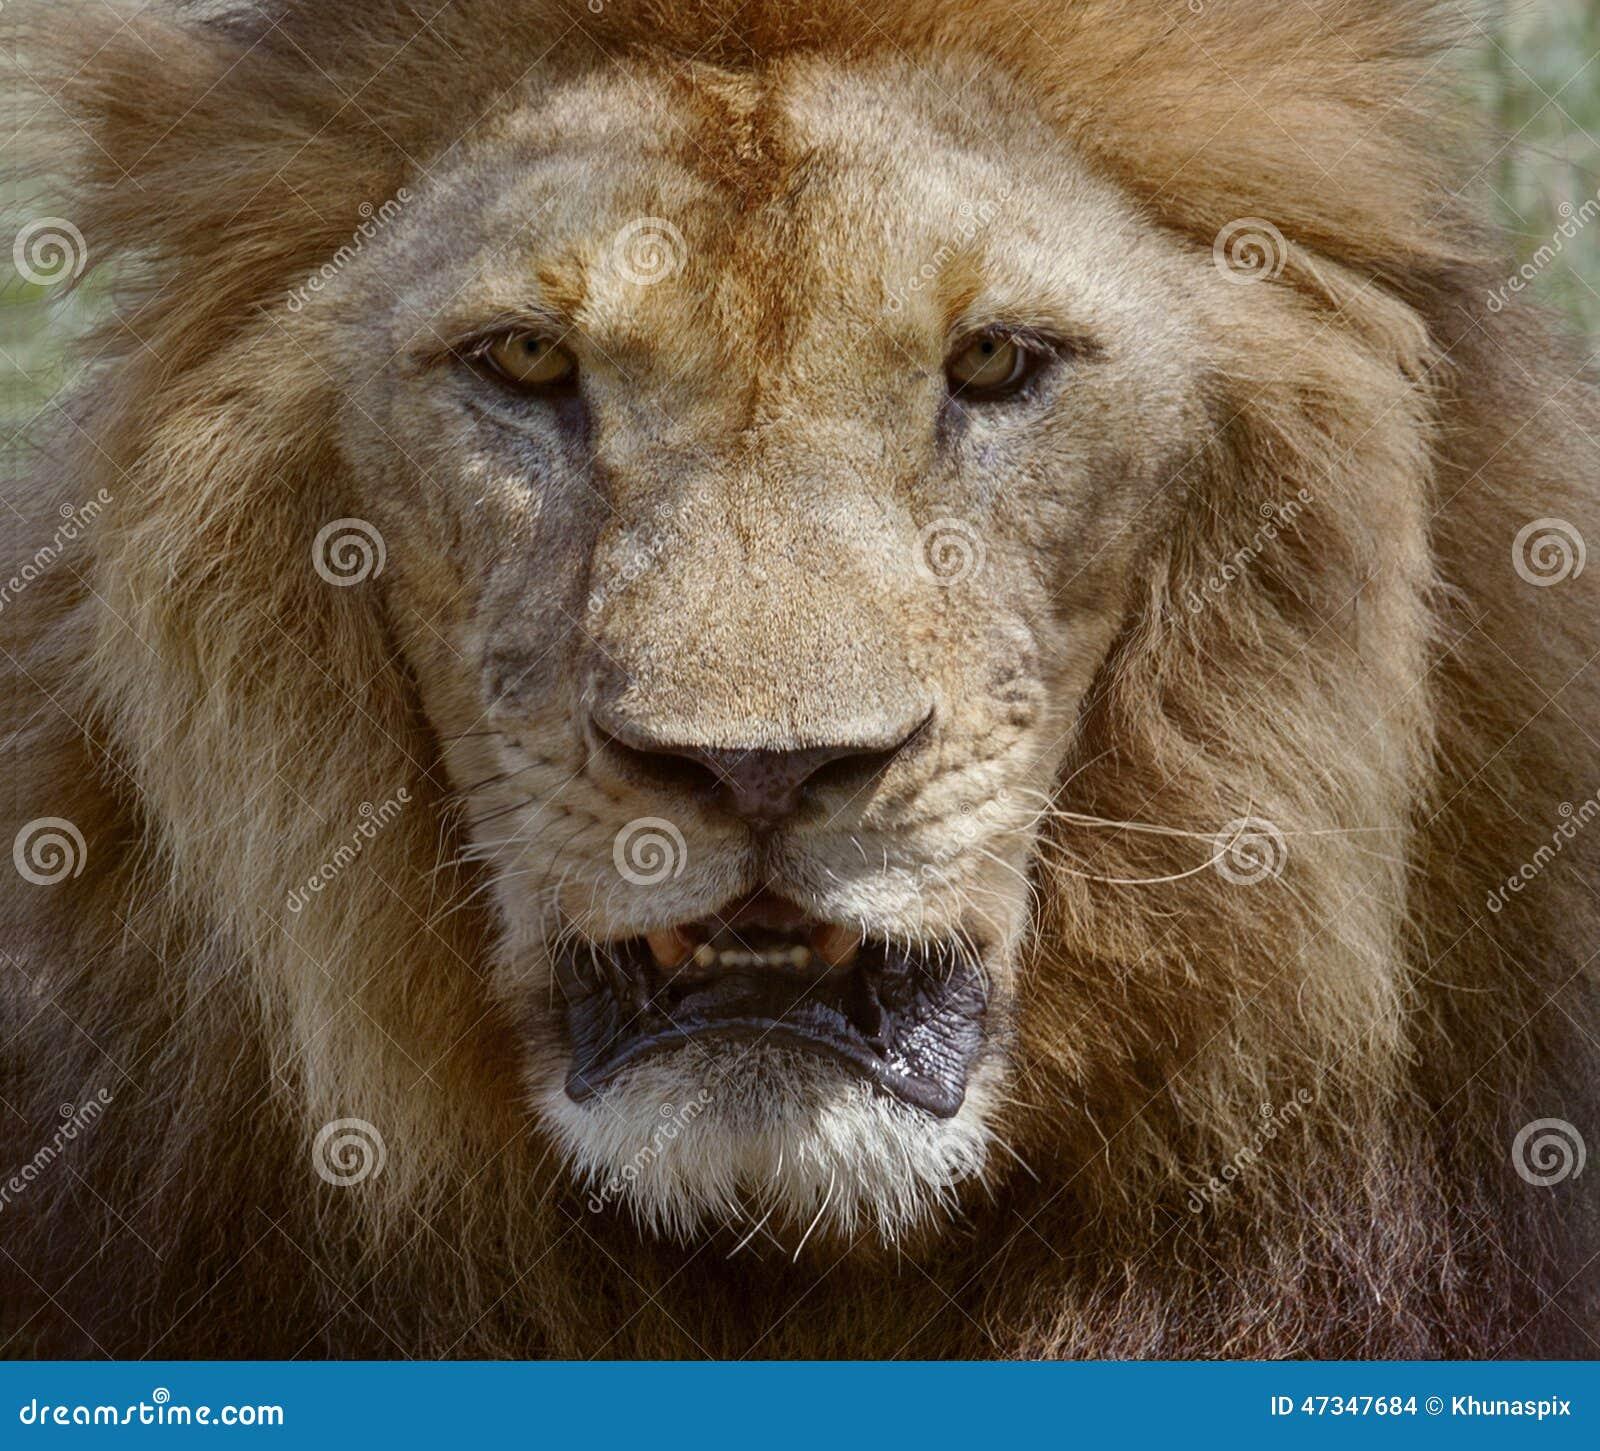 8k Animal Wallpaper Download: Close Up Face Of Male Lion Dangerous African Safari